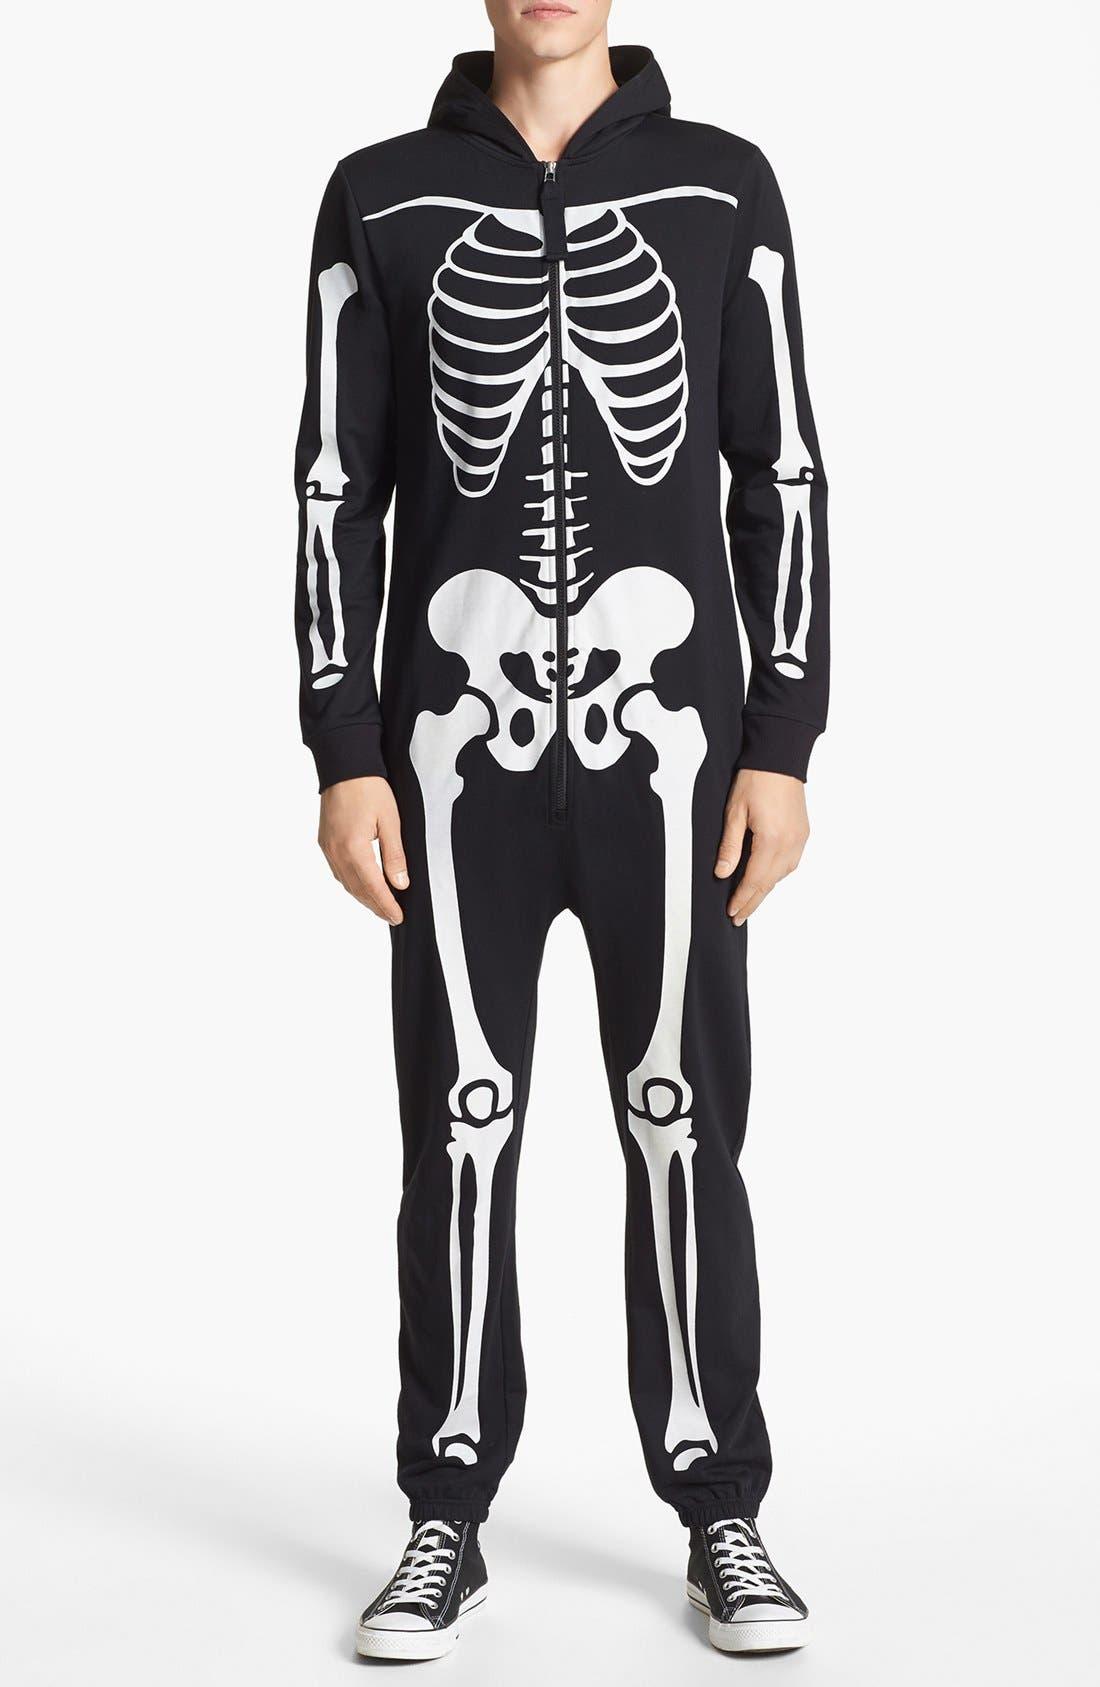 TOPMAN, Glow In The Dark Skeleton Print Bodysuit, Main thumbnail 1, color, 001